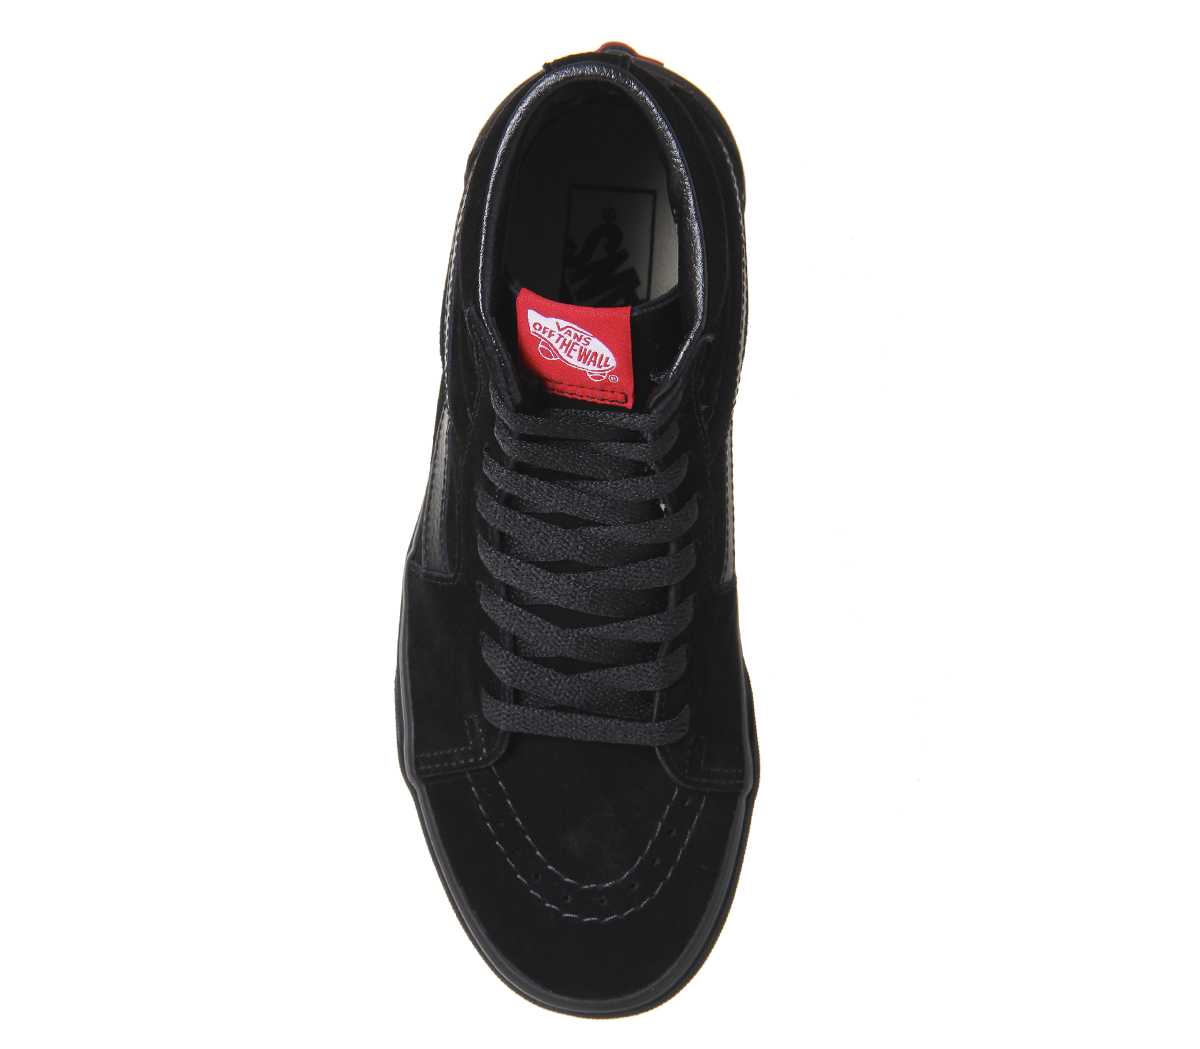 aab3ccf6315 Sentinel Womens Vans Sk8 Hi Black Suede Mono Trainers Shoes